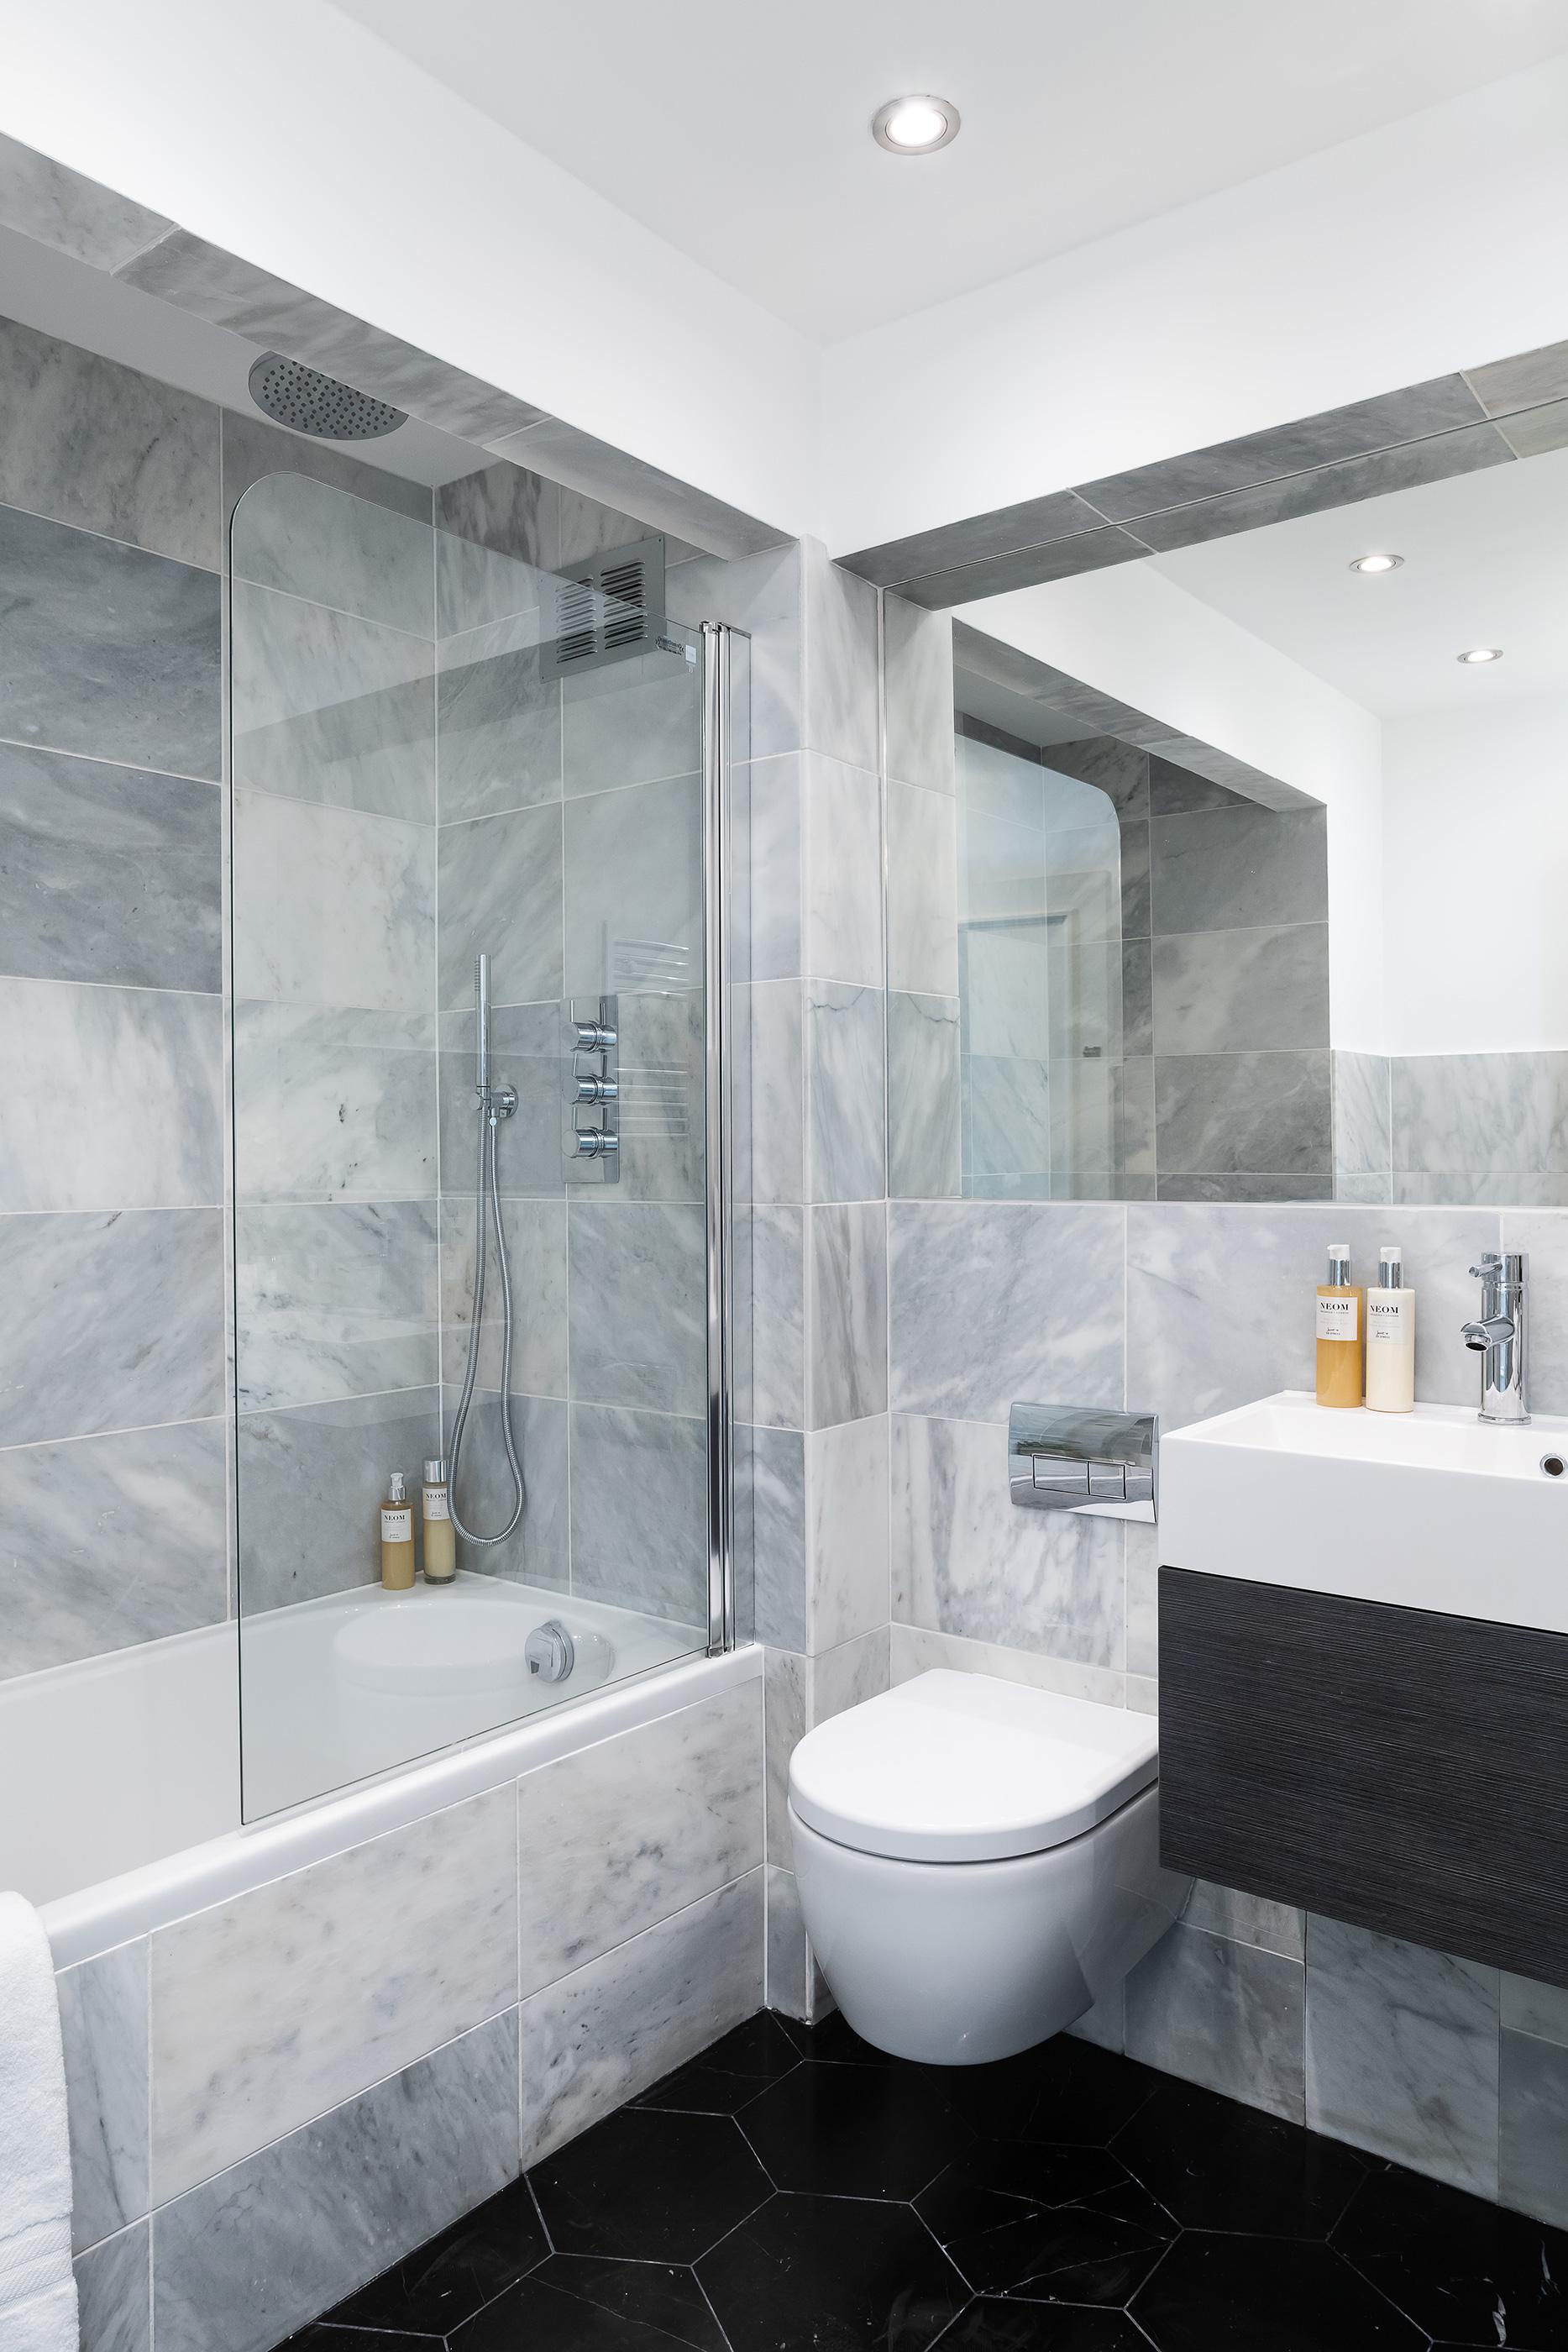 Bathroom_VR_10.jpg